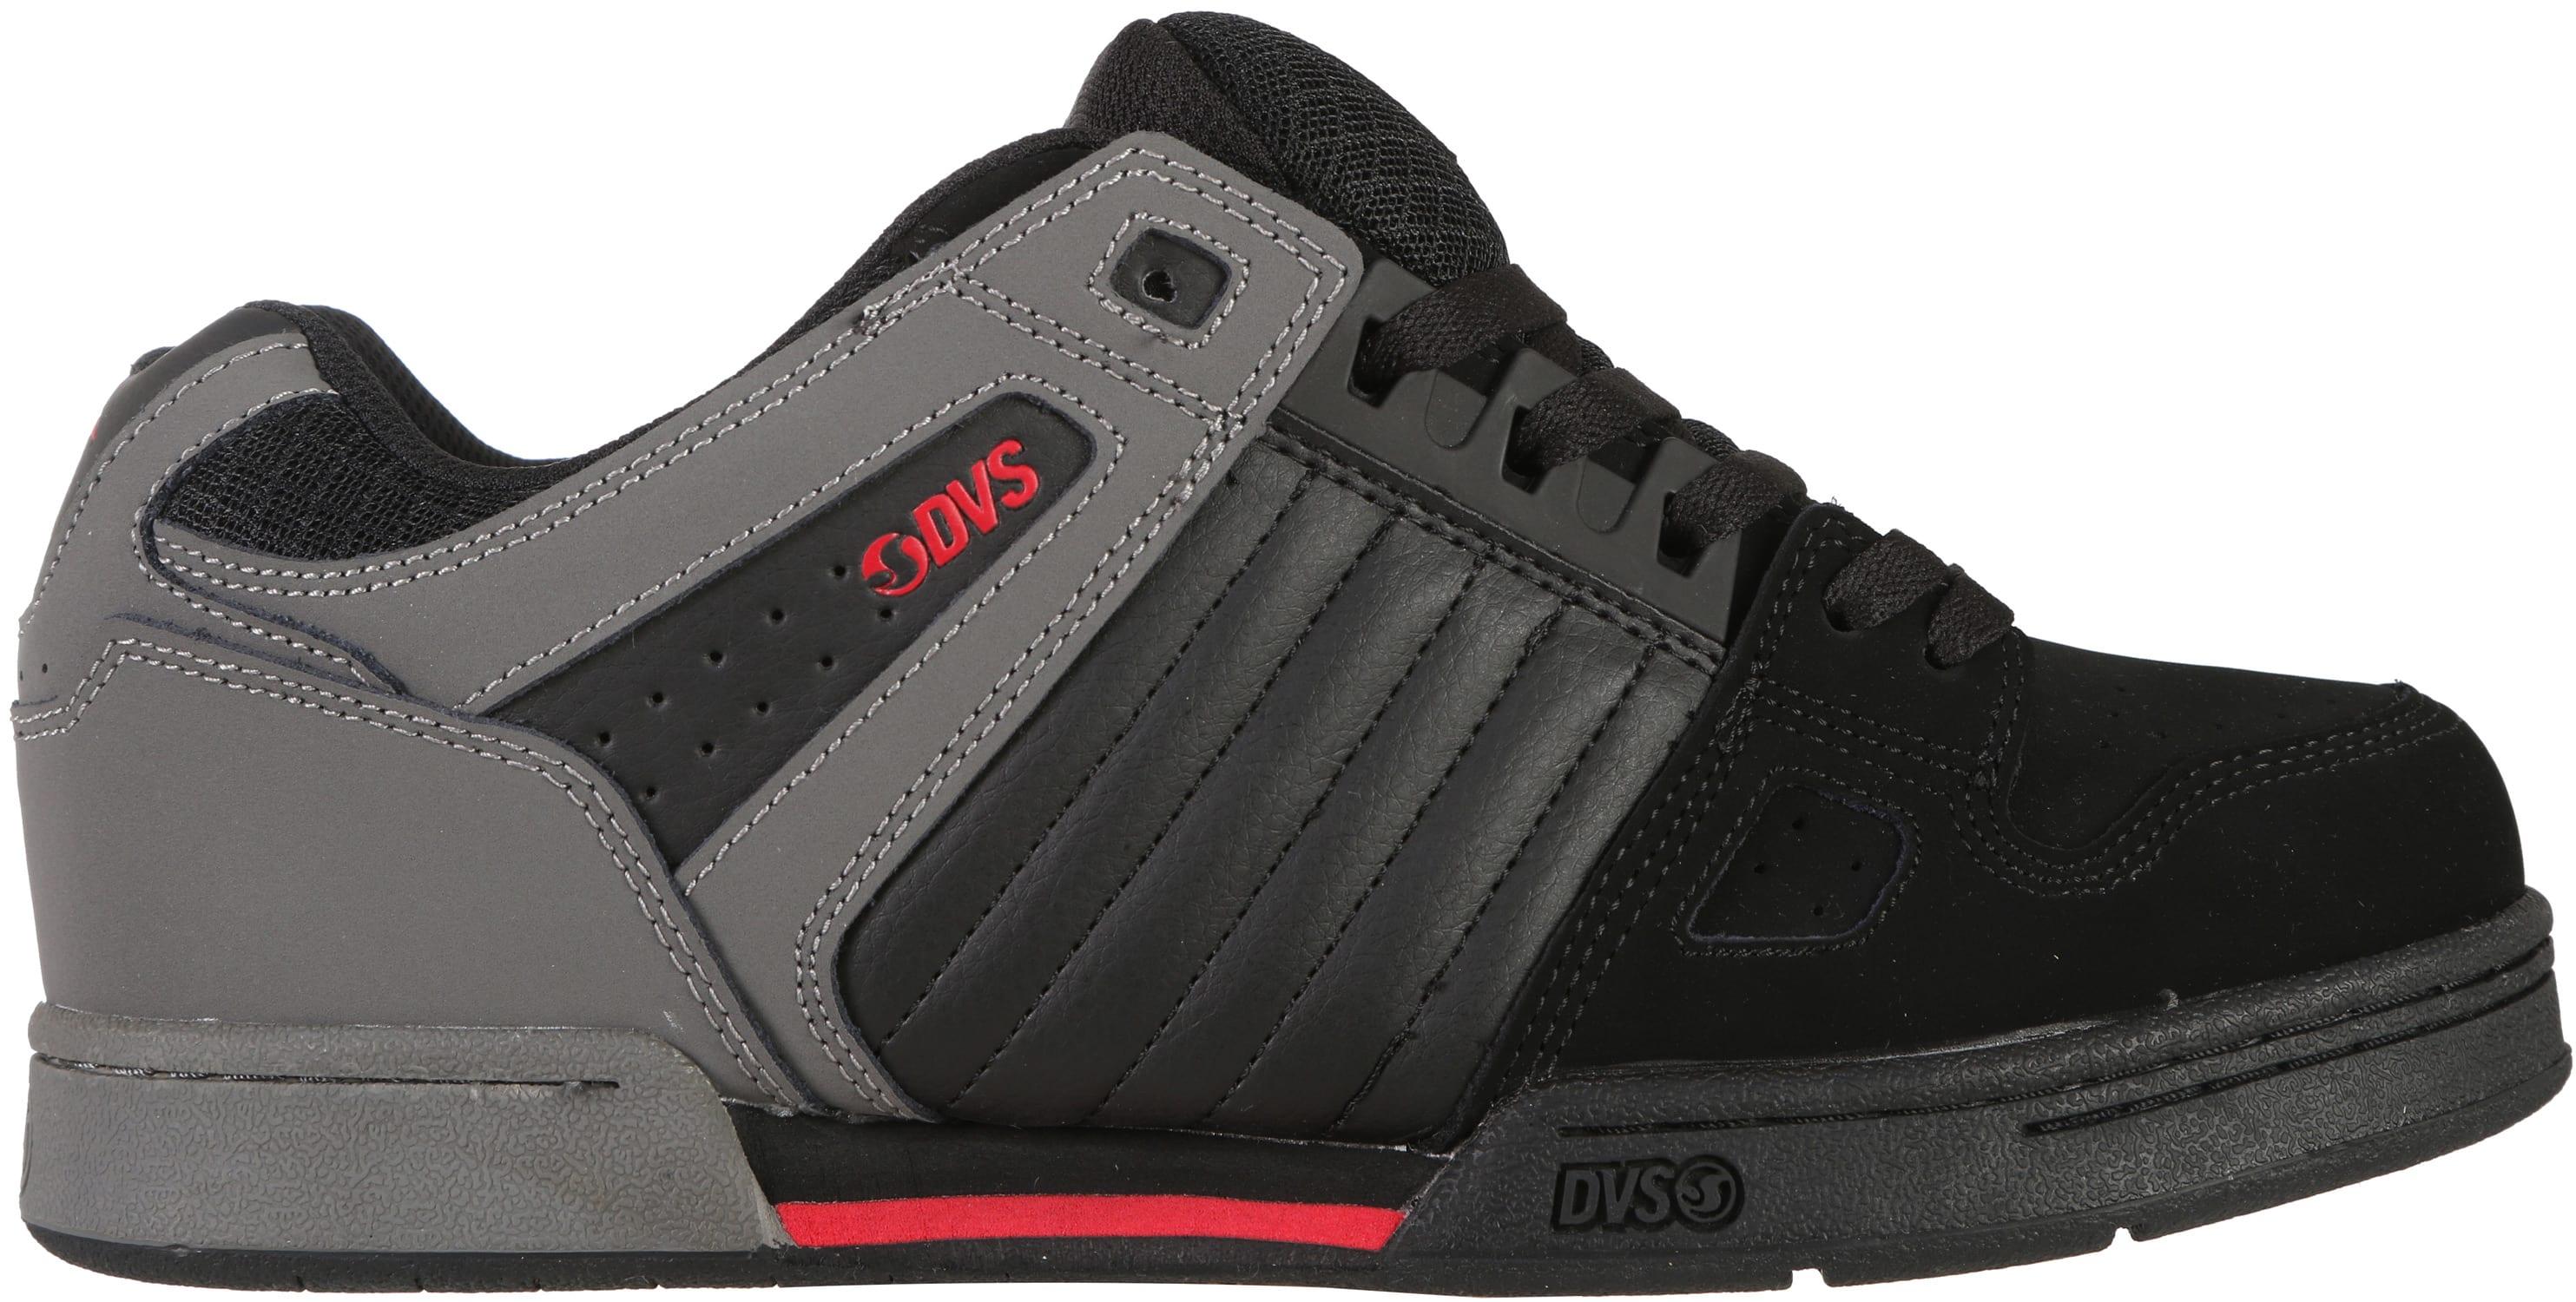 302e4c0390c Dvs celsius skate shoes black grey red jpg 2967x1500 Red dvs shoes